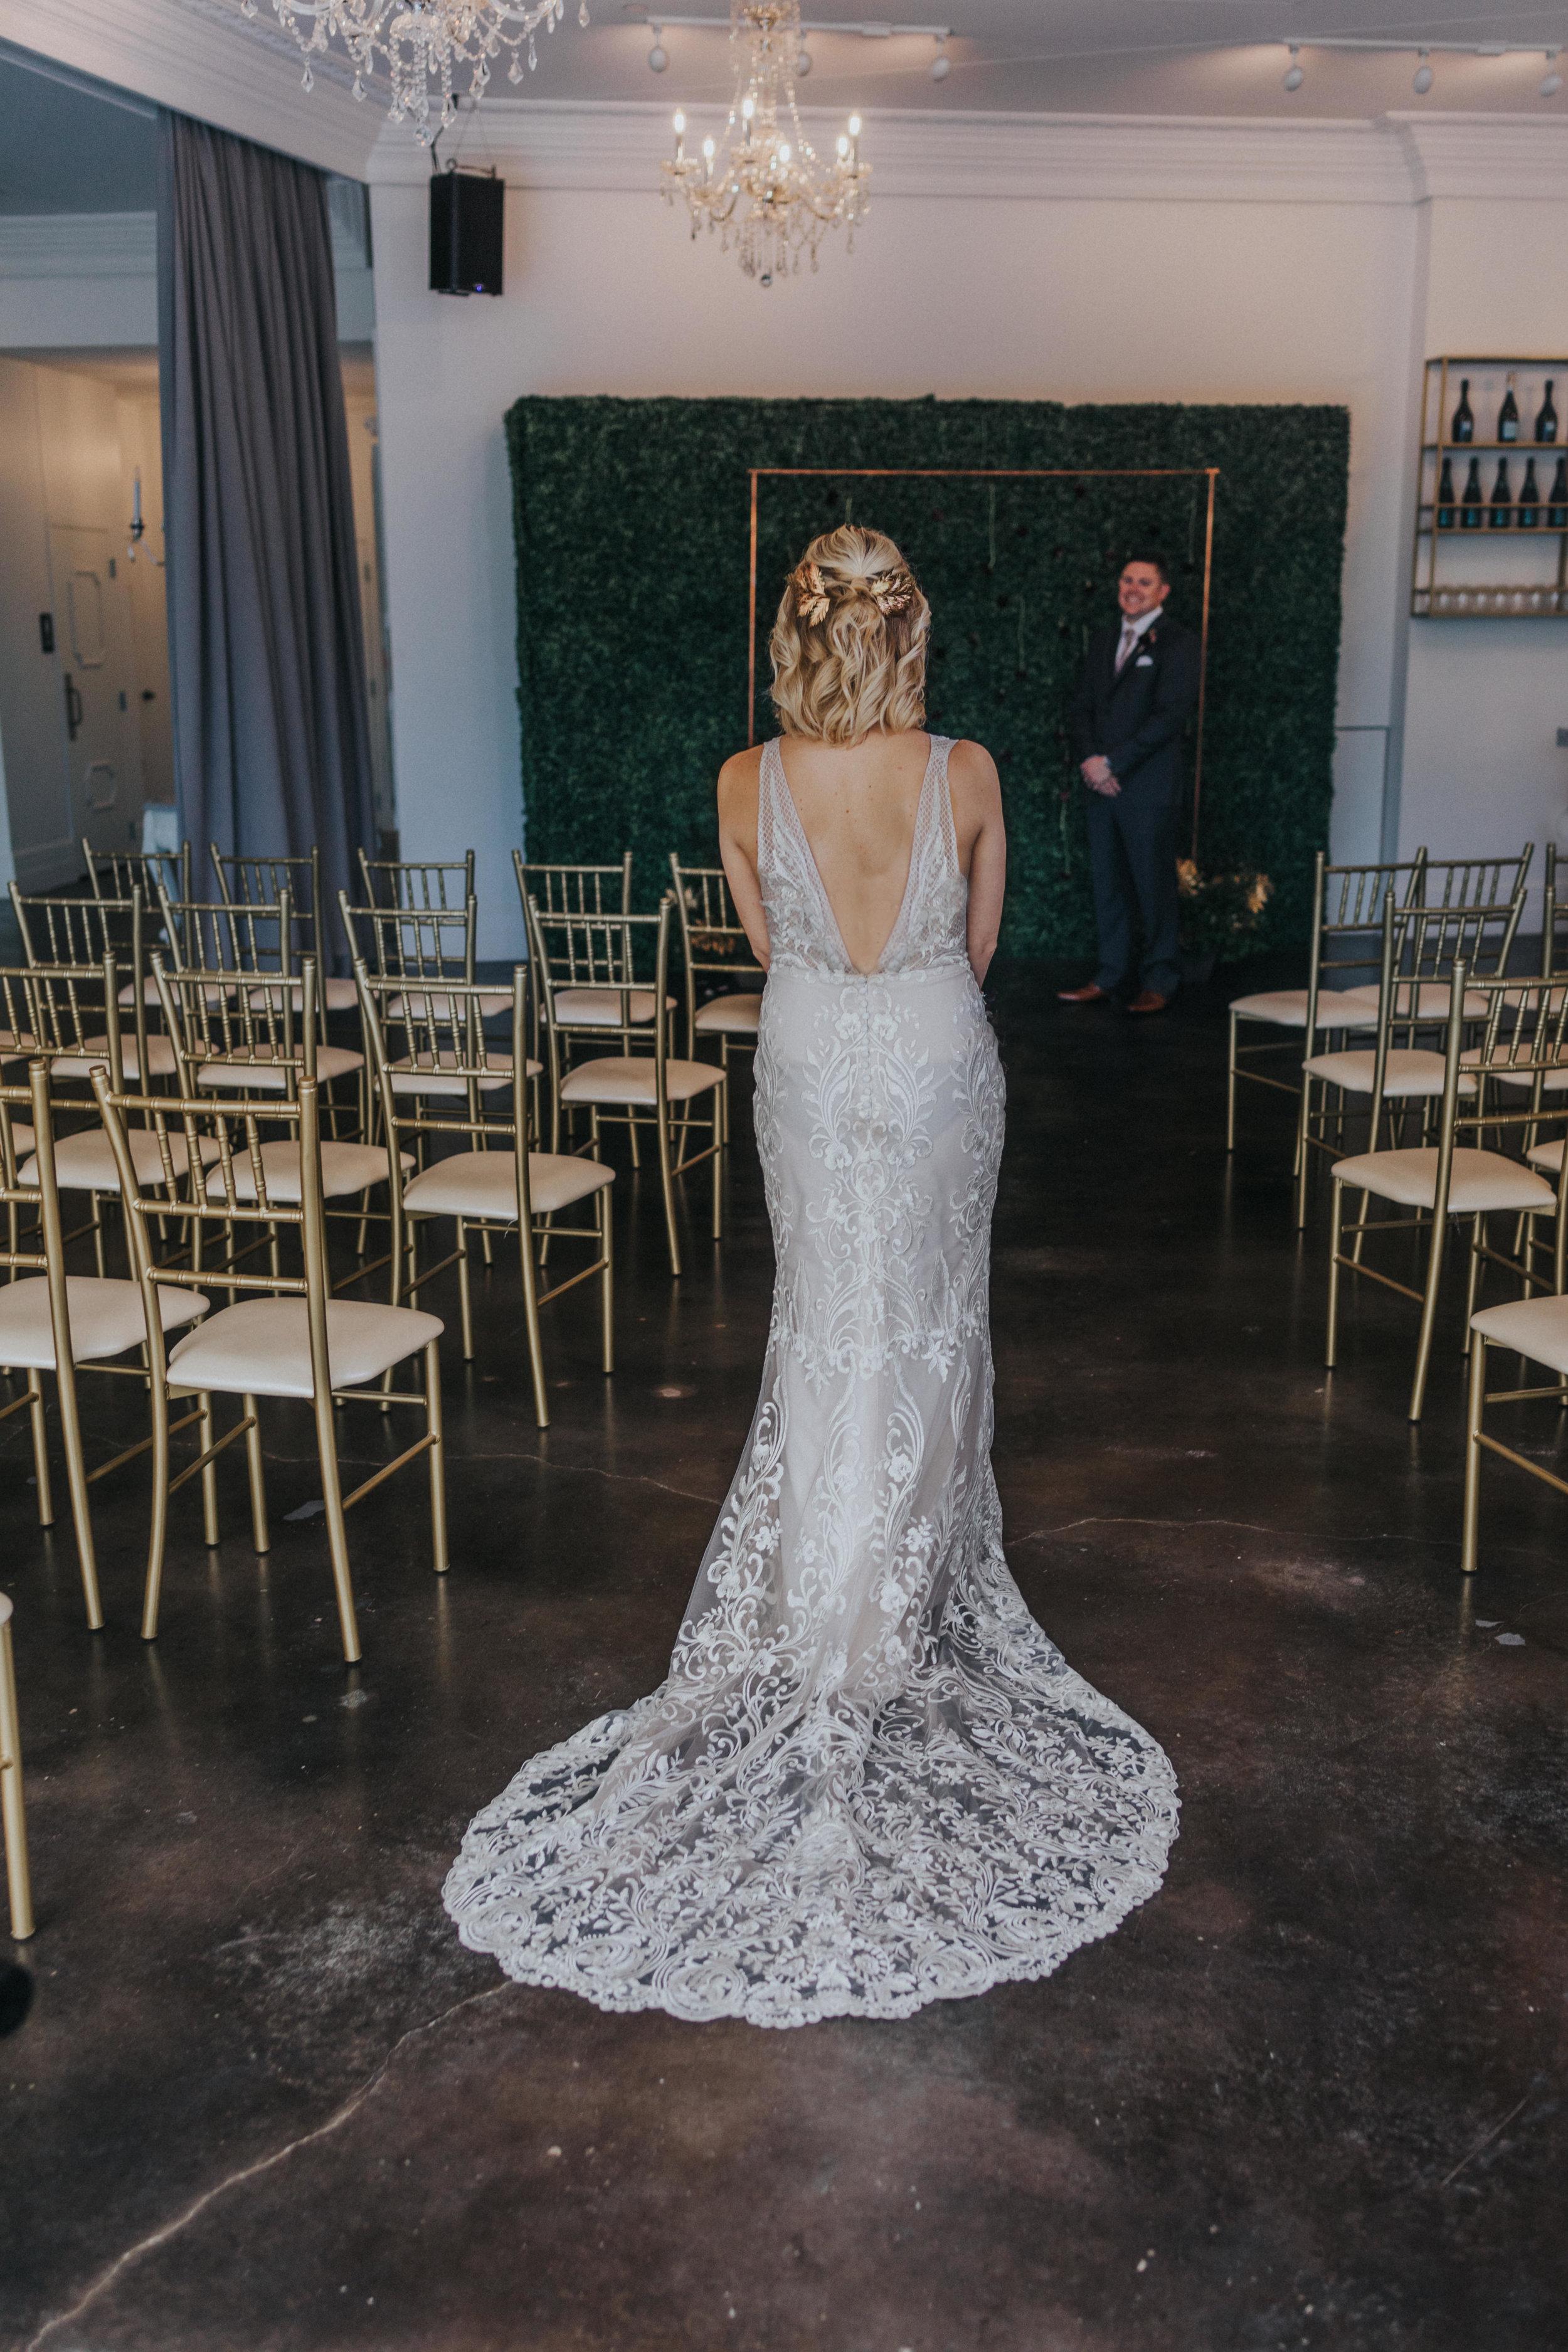 142 tiny-luxe-weddings-omaha-nebraska-midwest-empire-room.jpg